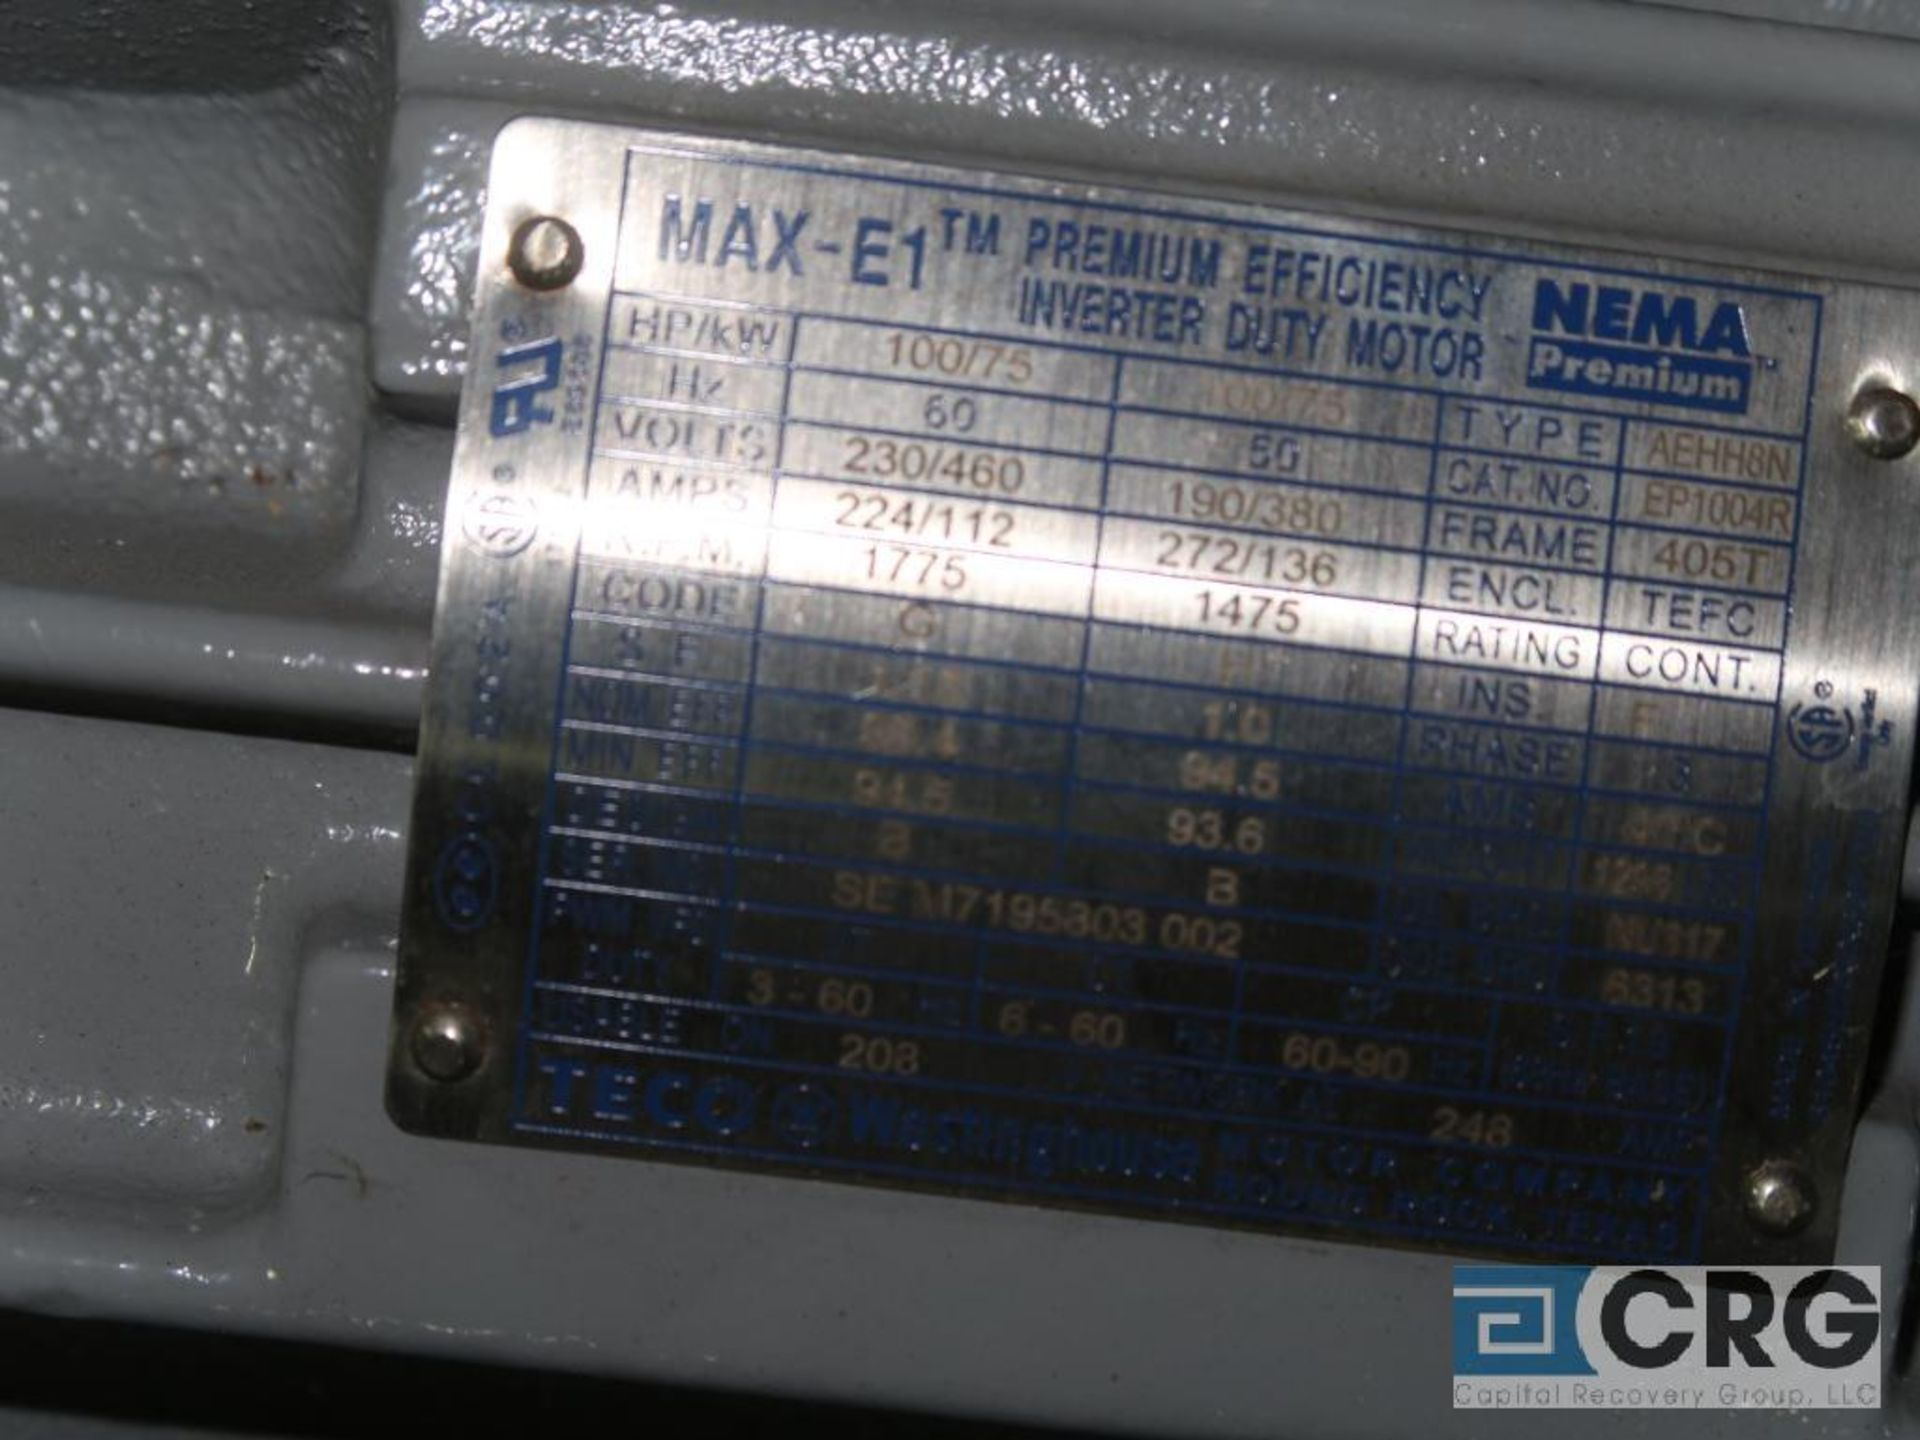 Teco Westinghouse MAX-E1 motor, 100 HP, 1,775 RPMs, 230/460 volt, 3 ph., 405T frame (Finish - Image 2 of 2